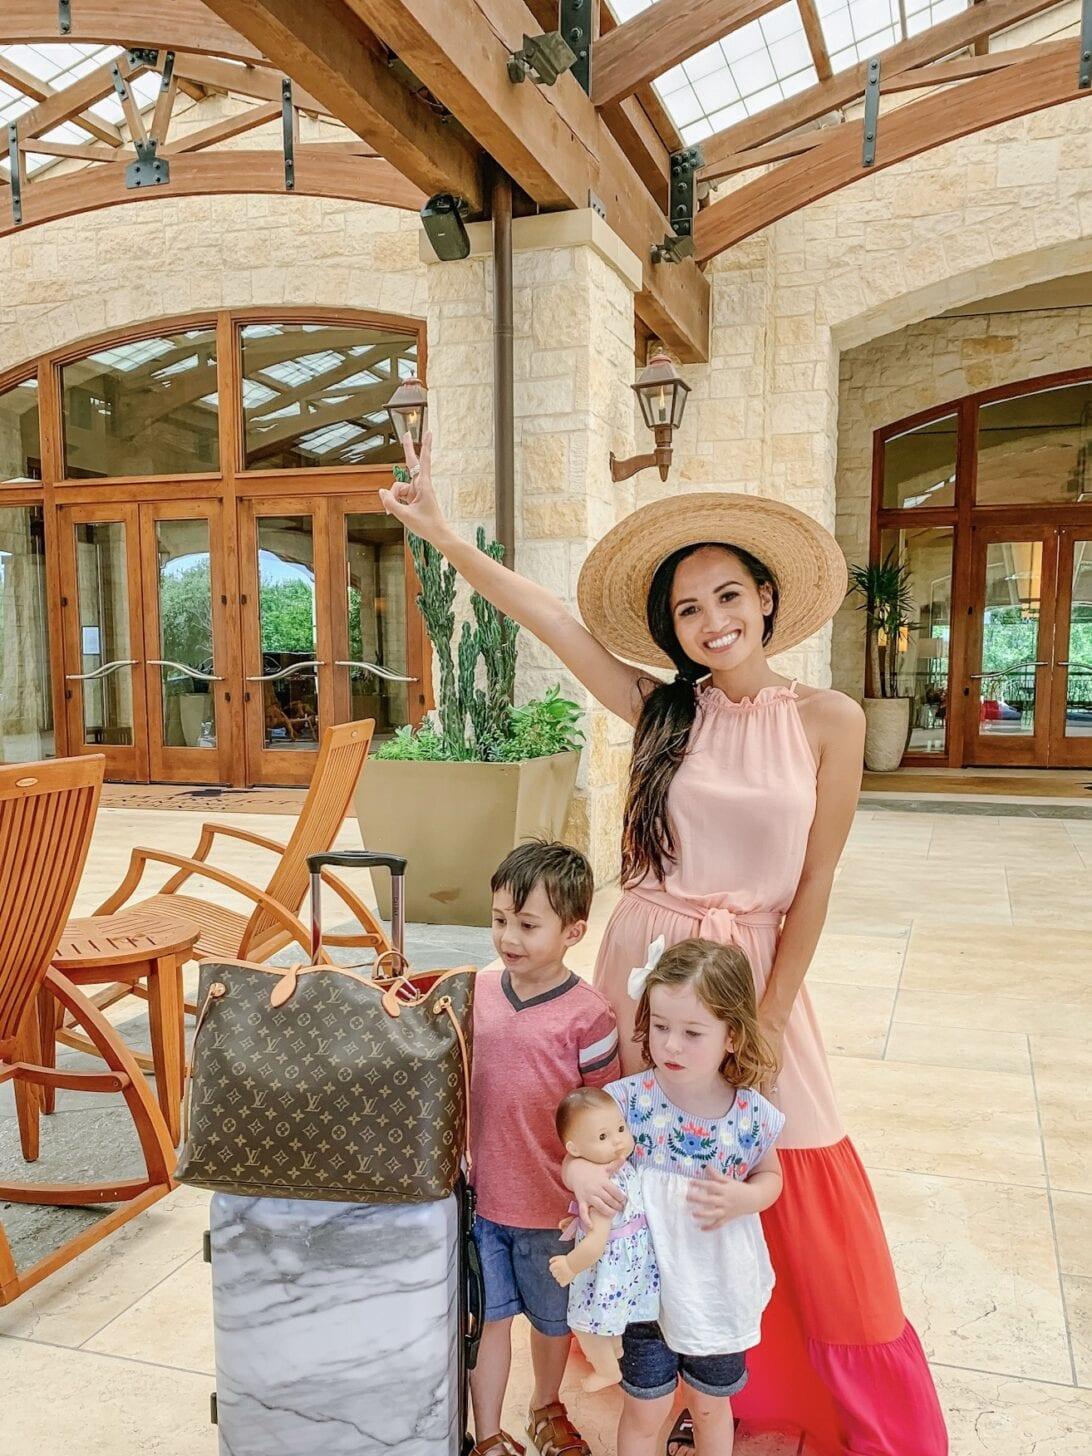 San Antonio HOTELS, San Antonio RESORTS, HILL COUNTRY RESORTS, Louis Vuitton NEVERFULL GM,